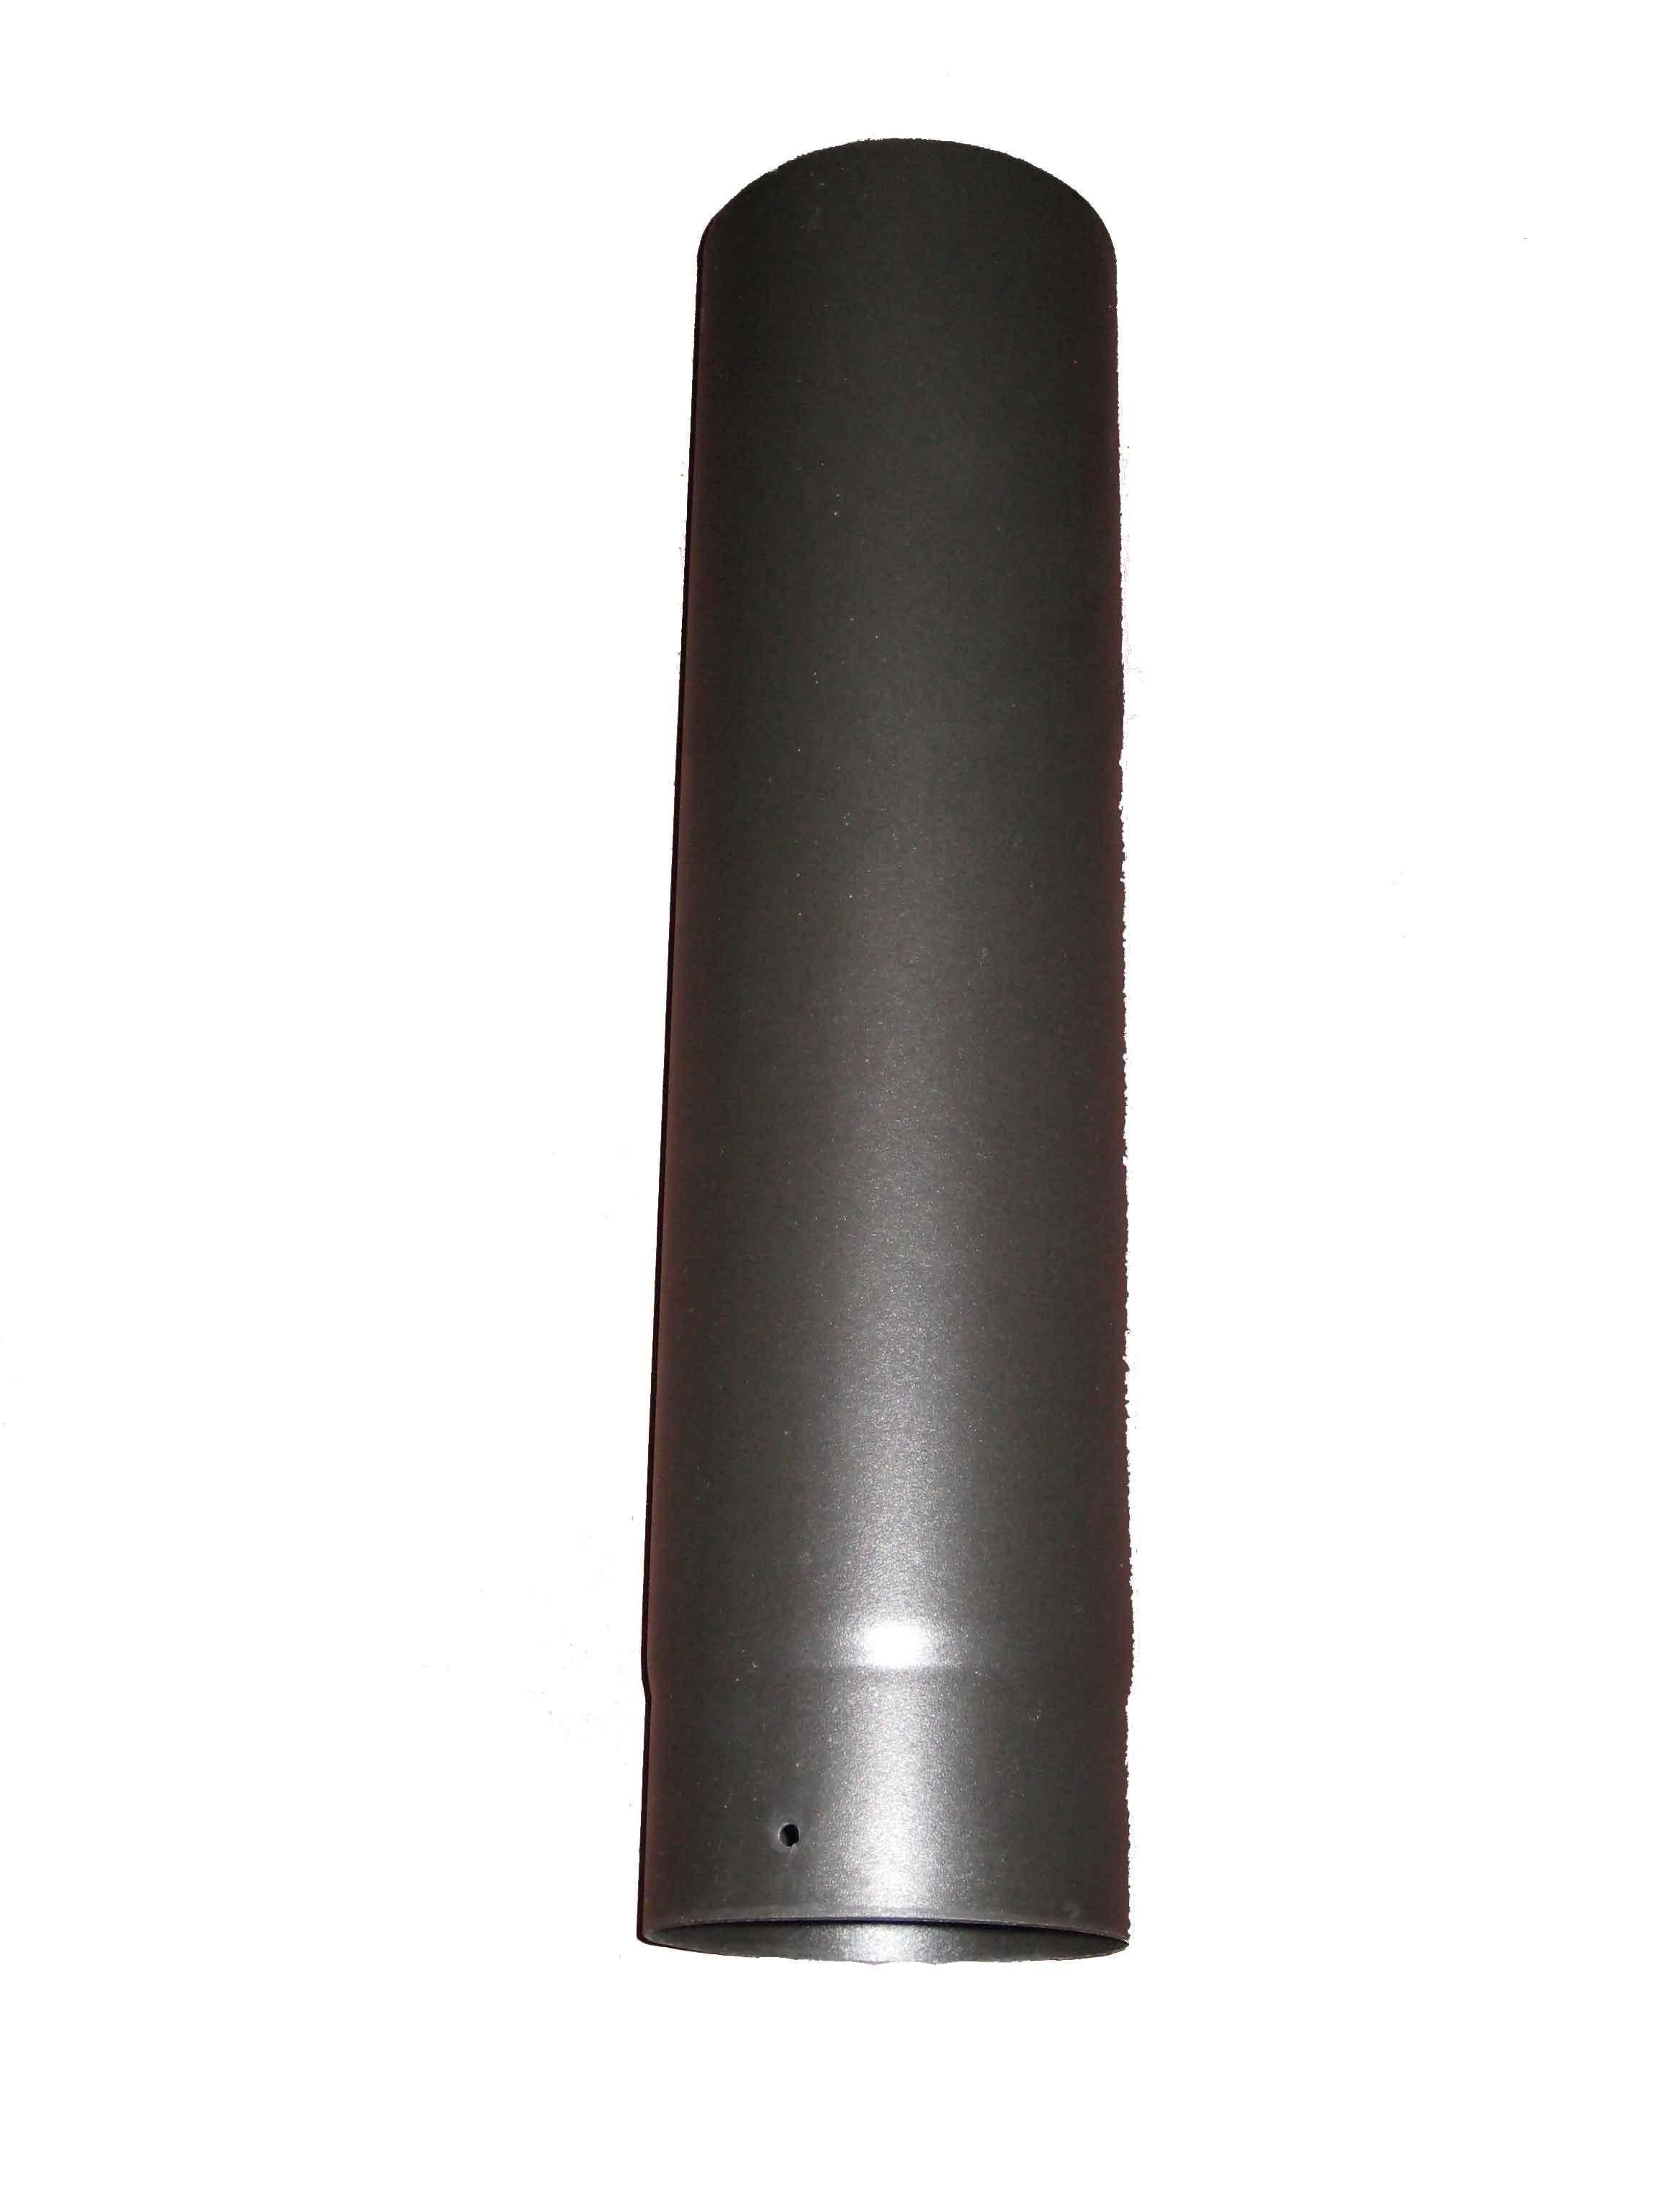 "Matt Black Enamel 1000mm Straight MBE Pipe 5"""